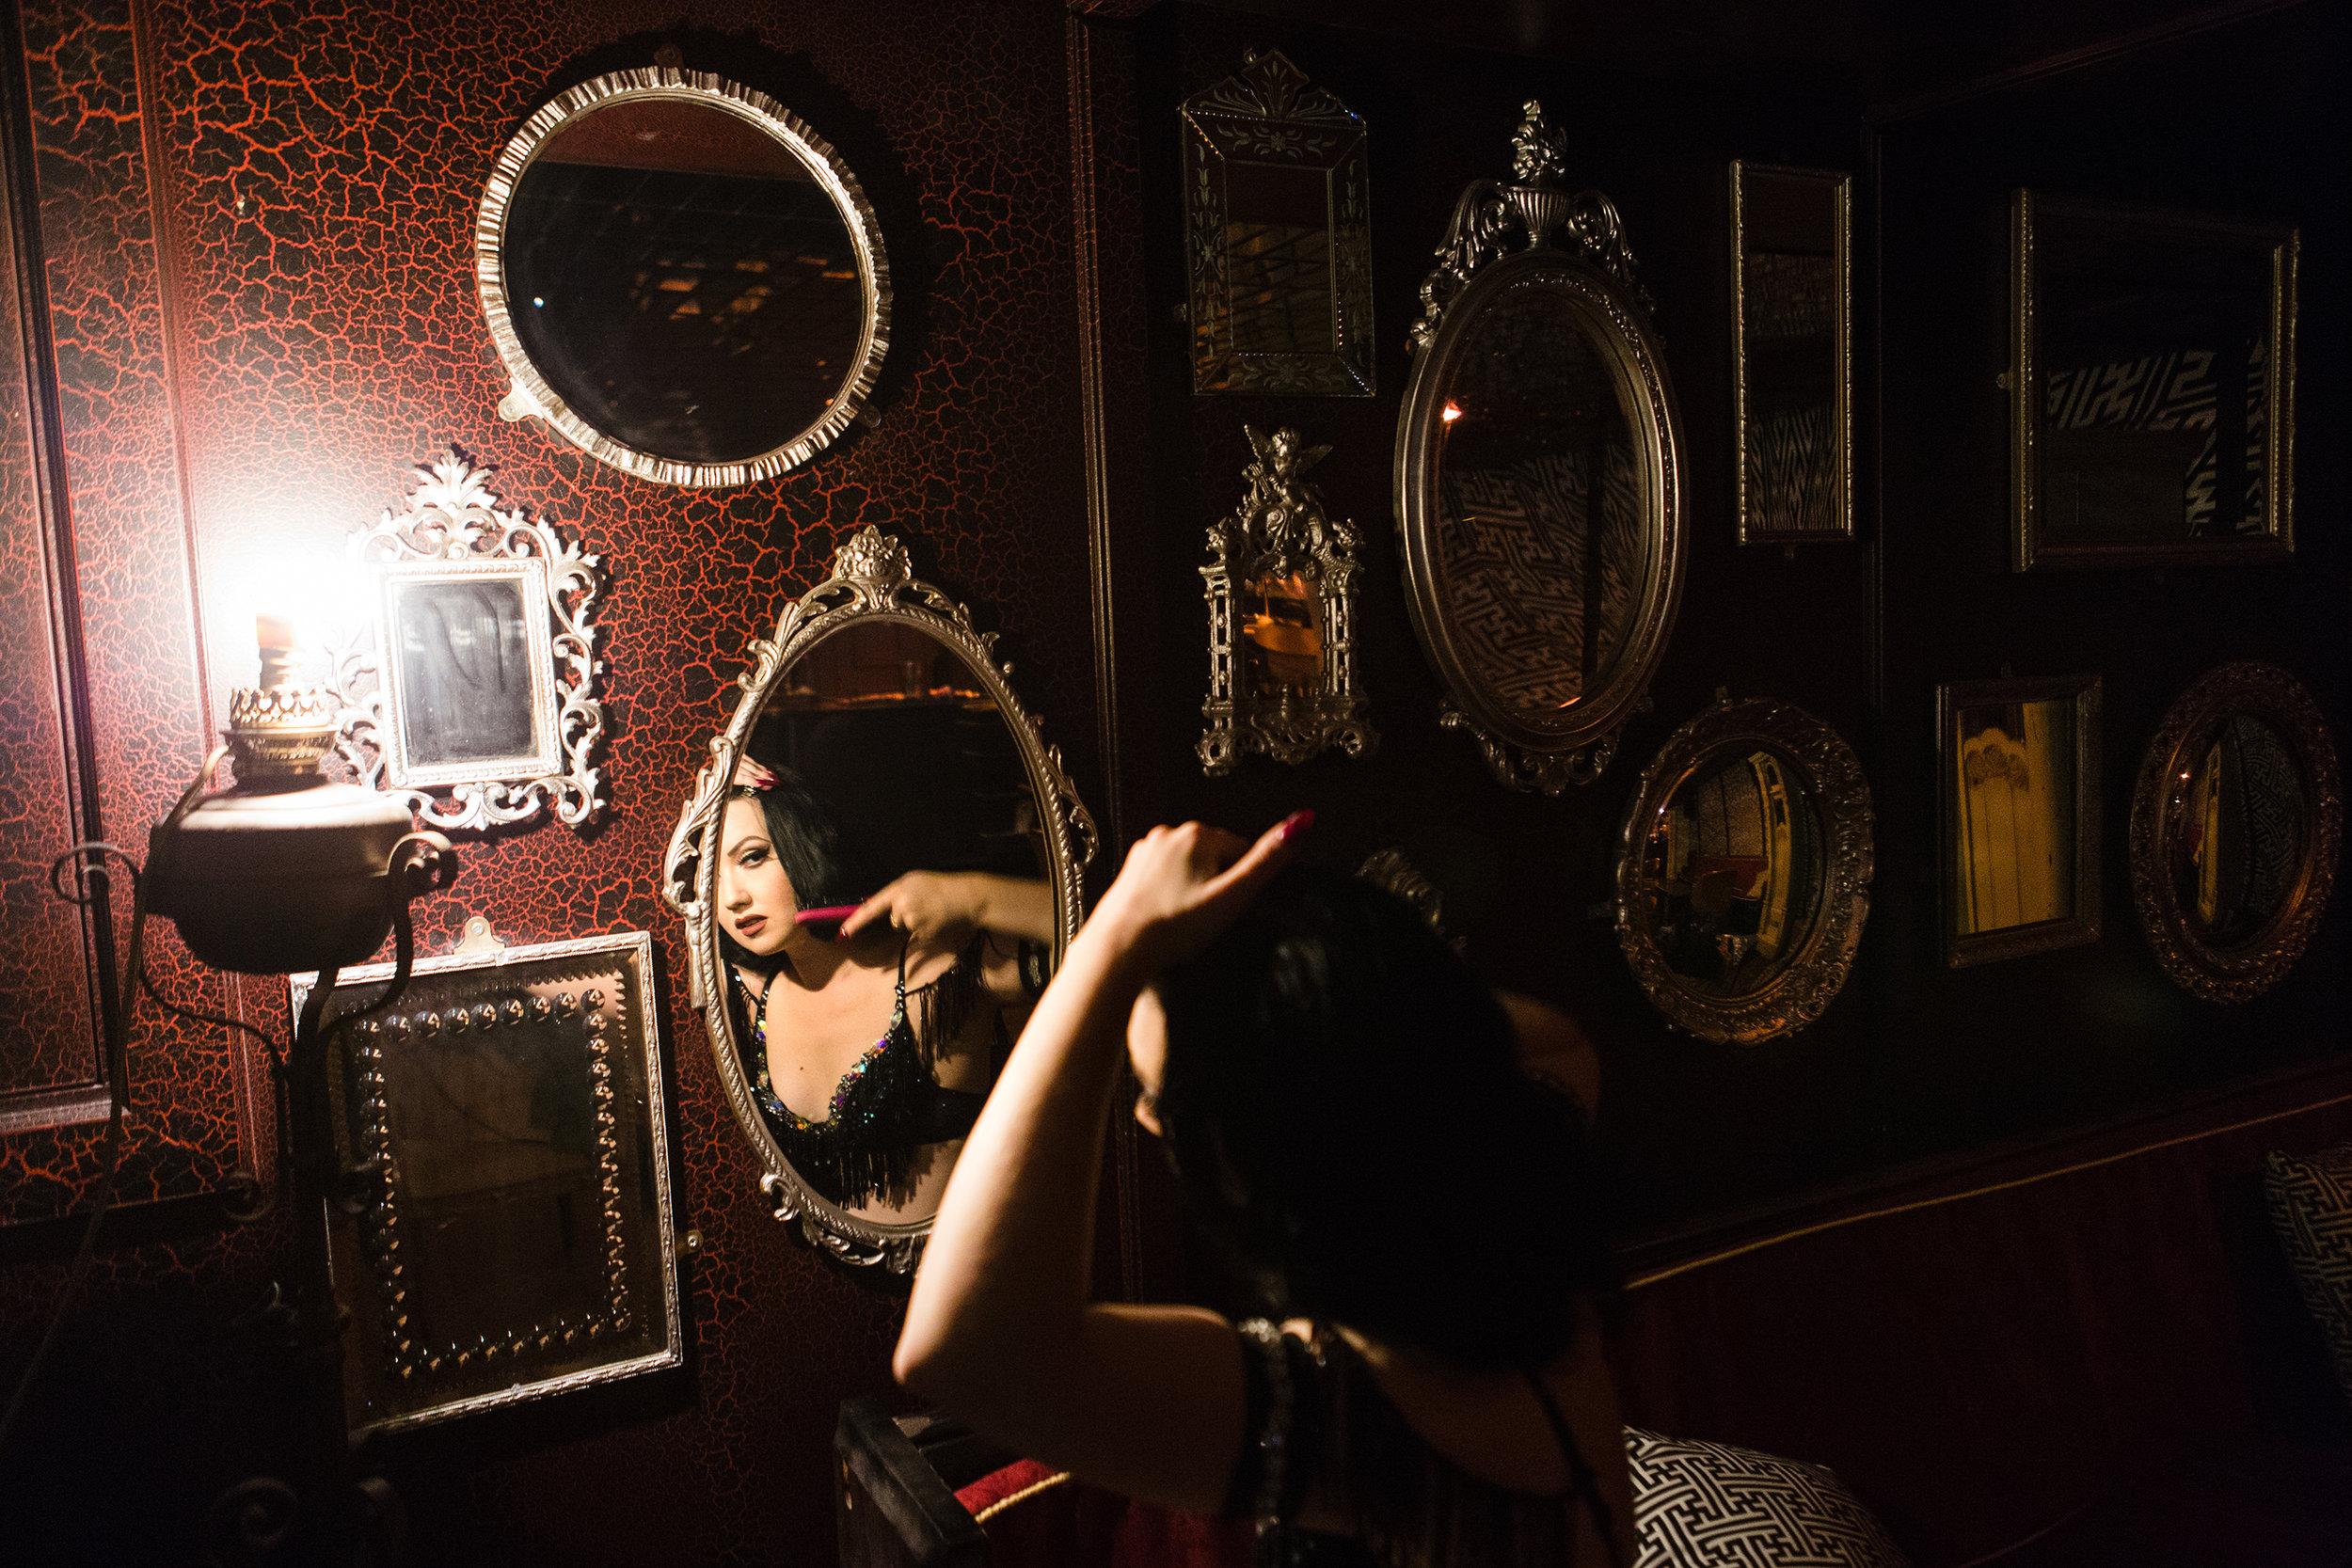 Burlesque dancer Eliza DeLite prepares for a show. London, UK